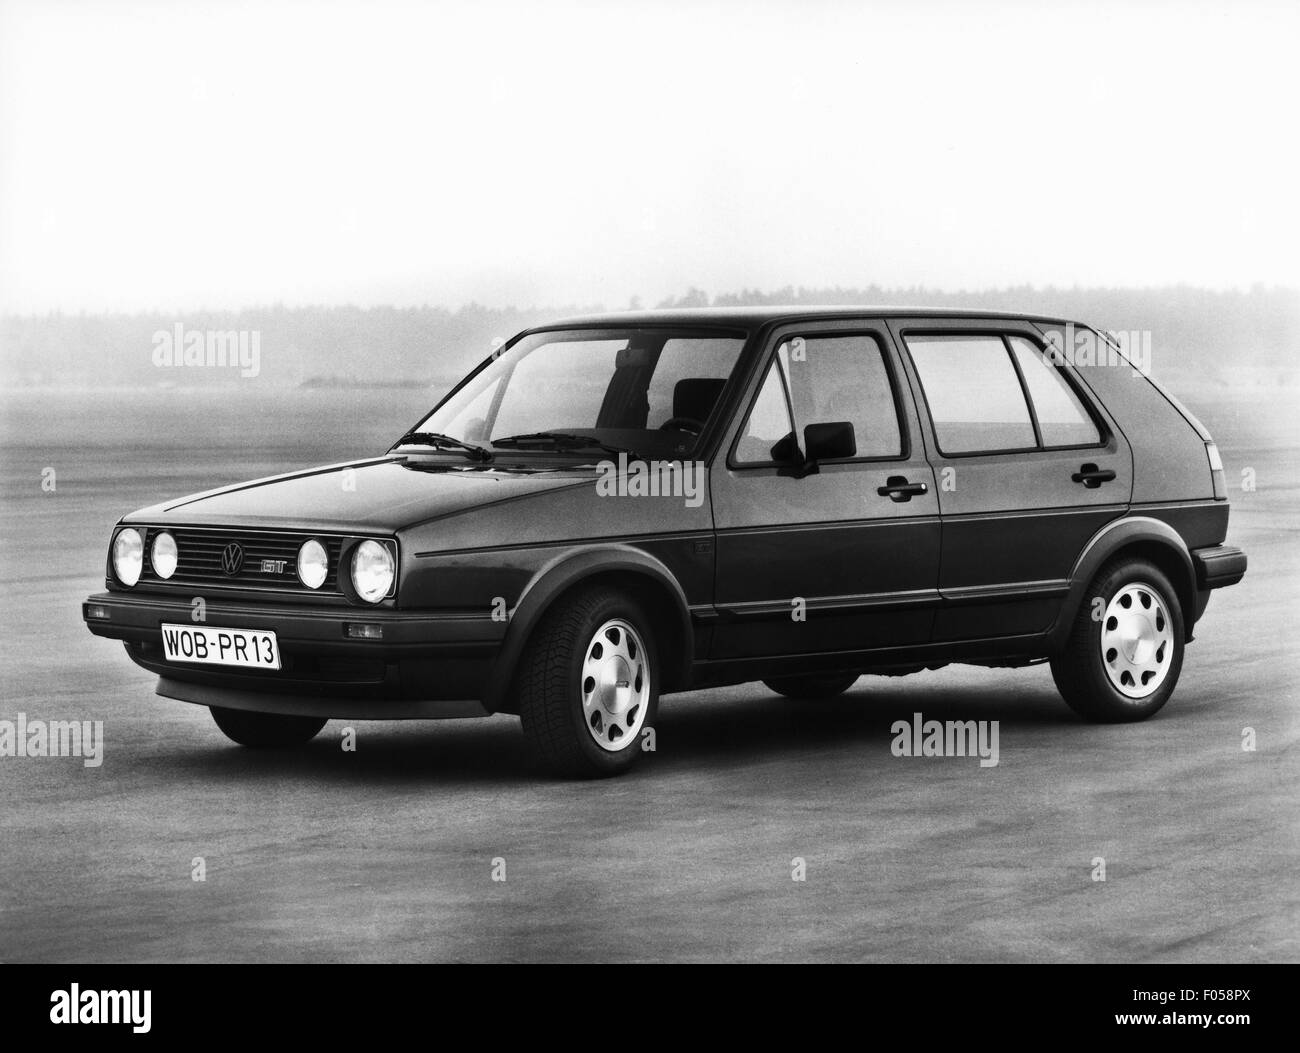 transport / transportation, car, vehicle variants, Volkswagen, VW Golf Mk2 GT, 1980s, Additional-Rights-Clearences - Stock Image